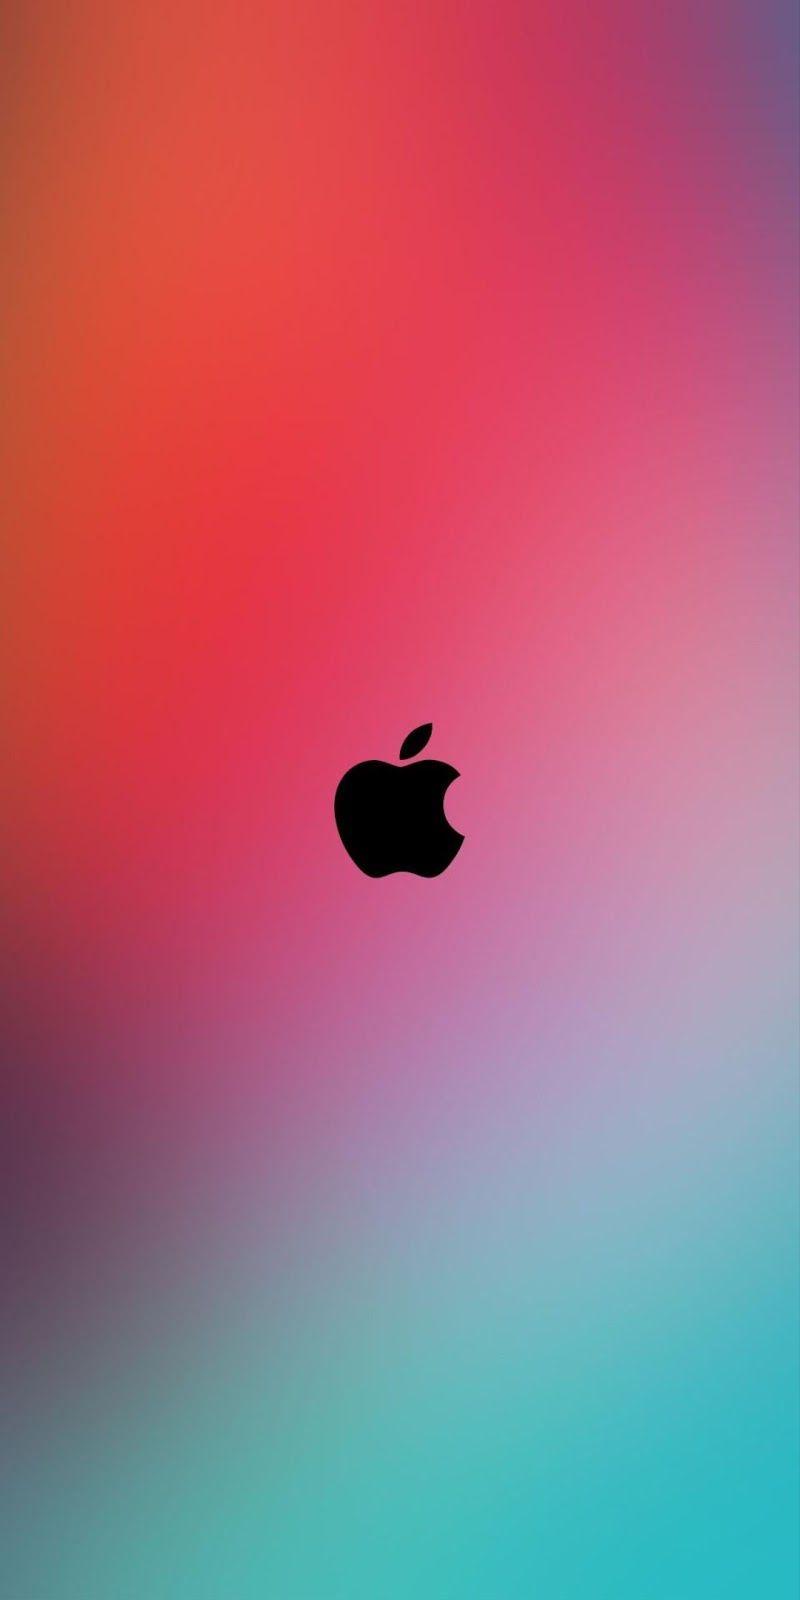 iColor #applewallpaperiphone - hetora #applewallpaperiphone